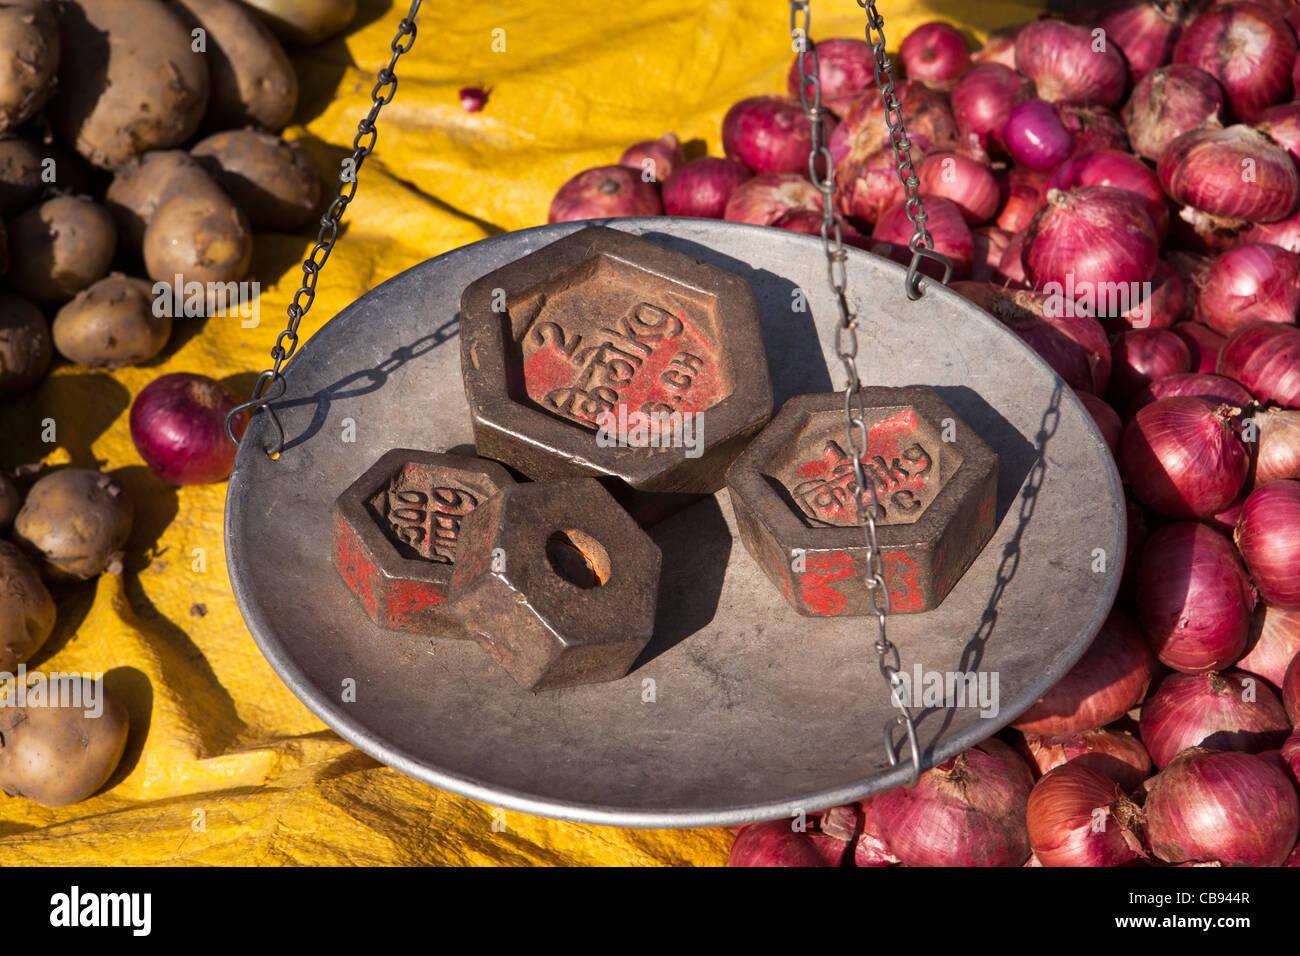 India, Meghalaya, Jaintia Hills, Shillong district, Ummulong Bazar, onion stall, weights on scales - Stock Image